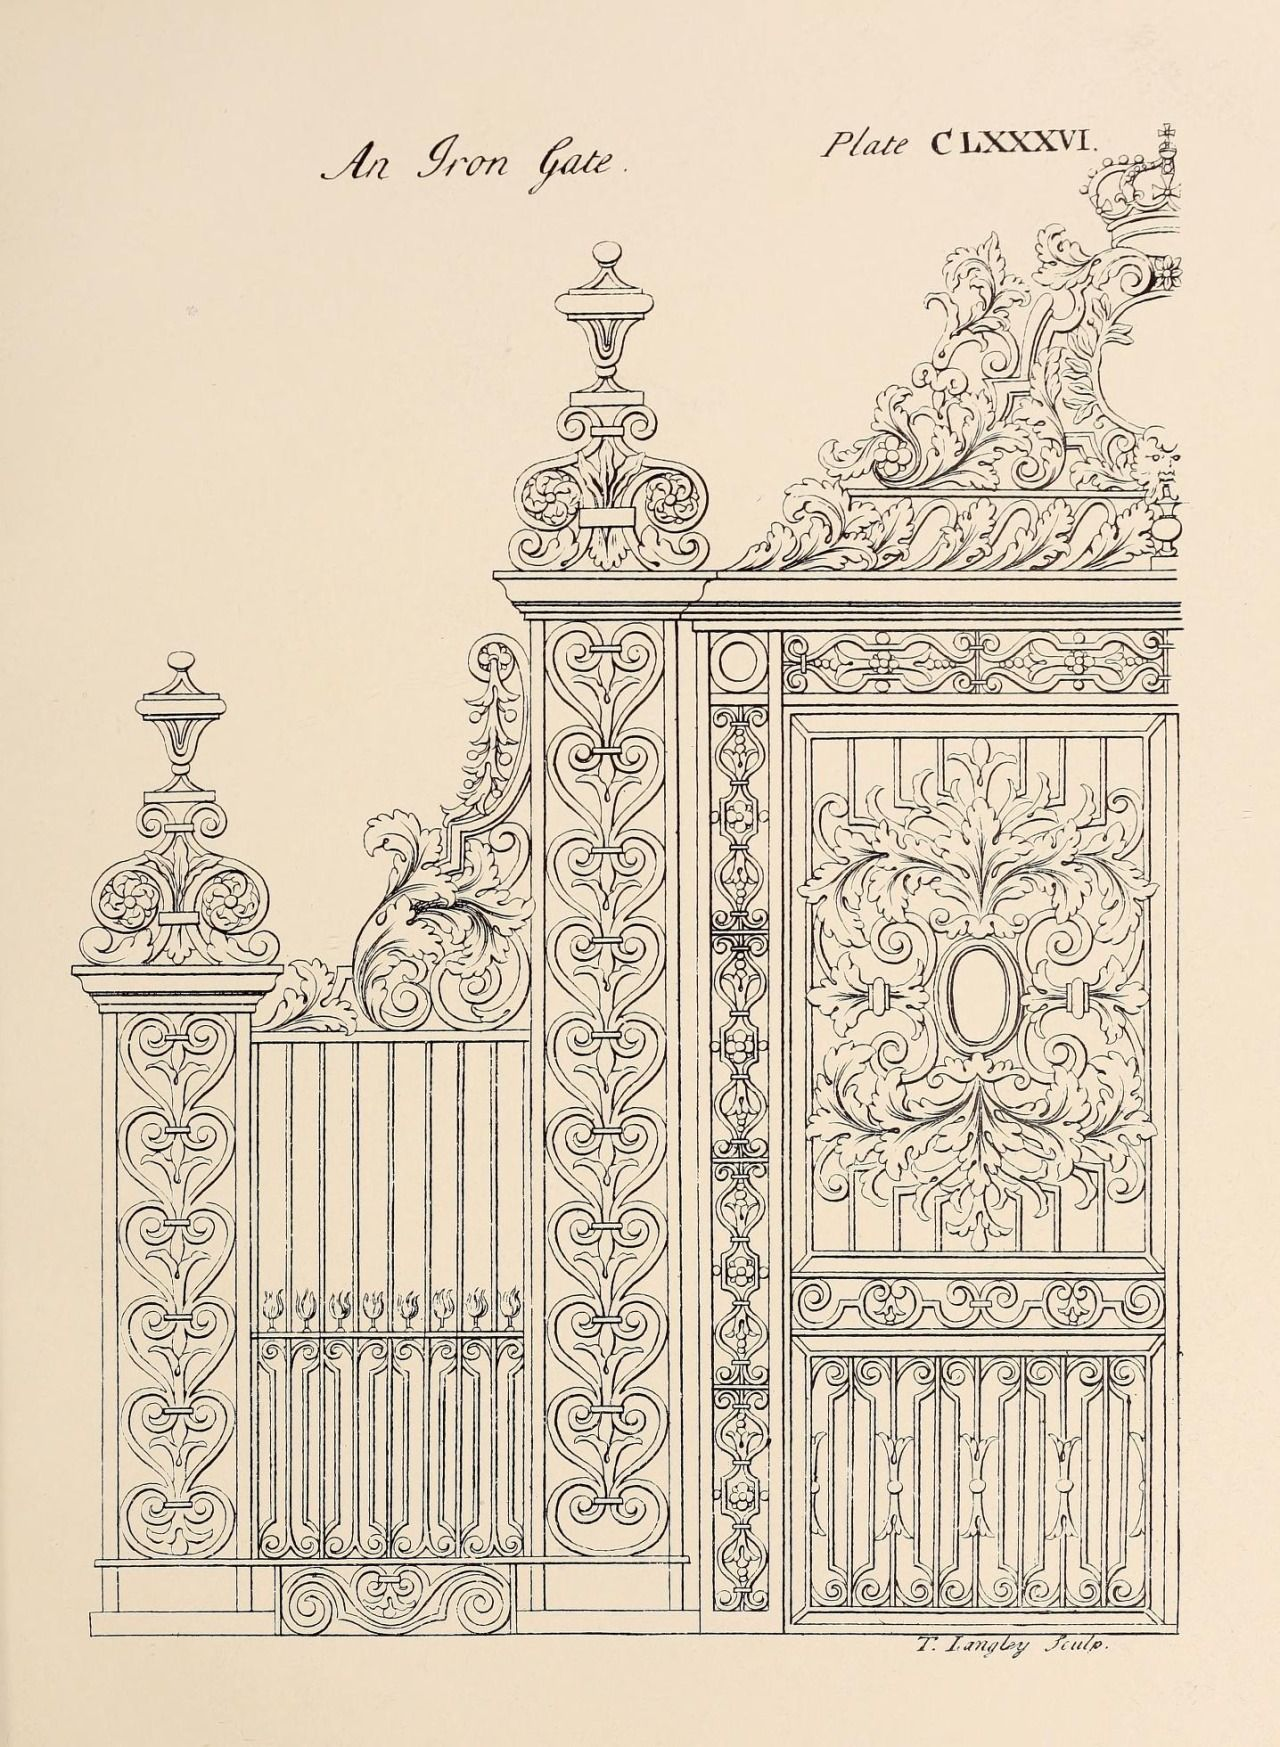 Interior Design Hand Sketches: Design For An Iron Gate …